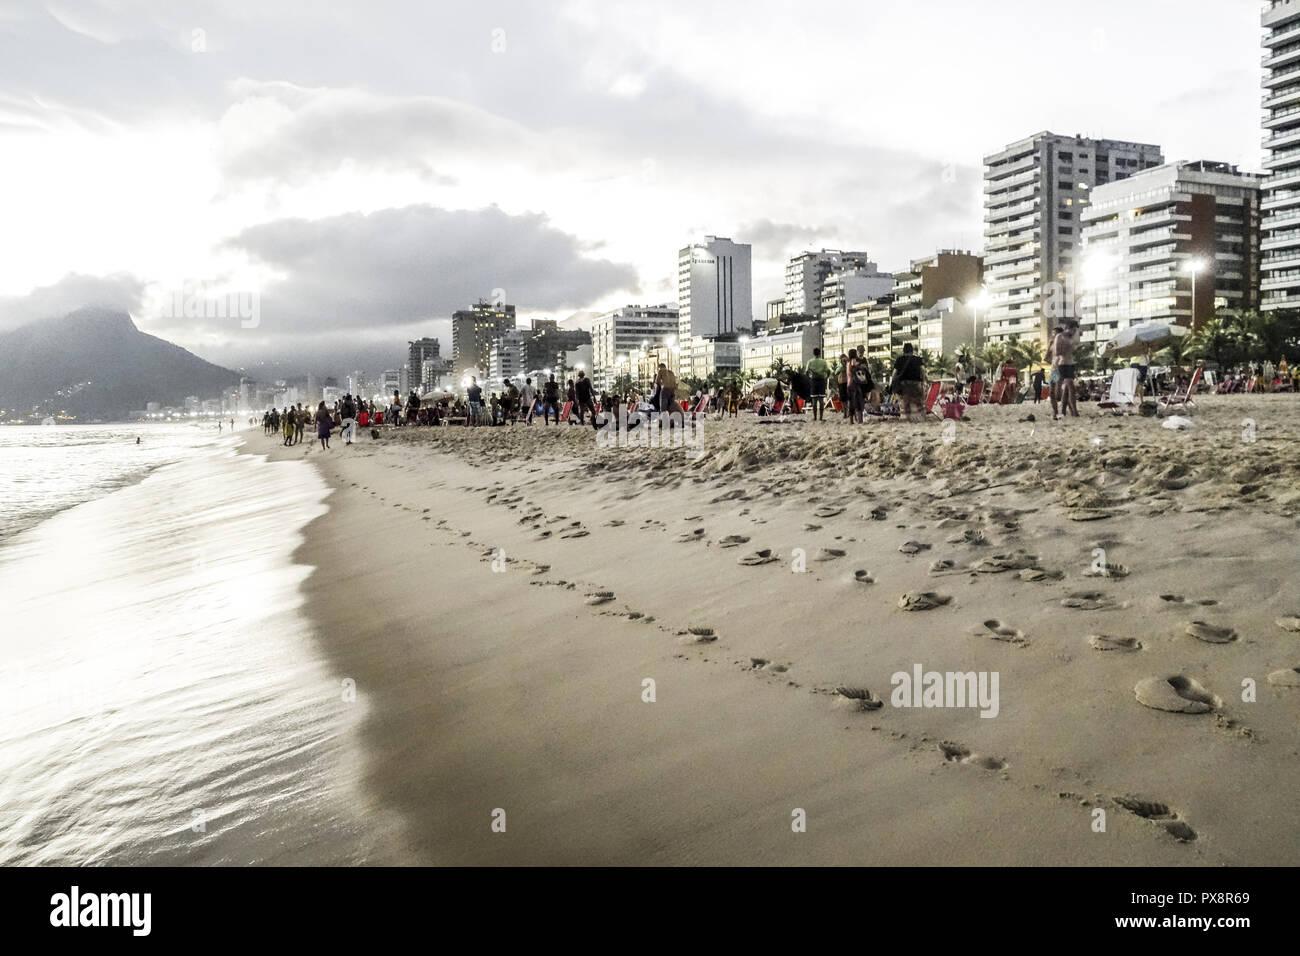 Río de Janeiro, la playa de Ipanema, Brasil Imagen De Stock